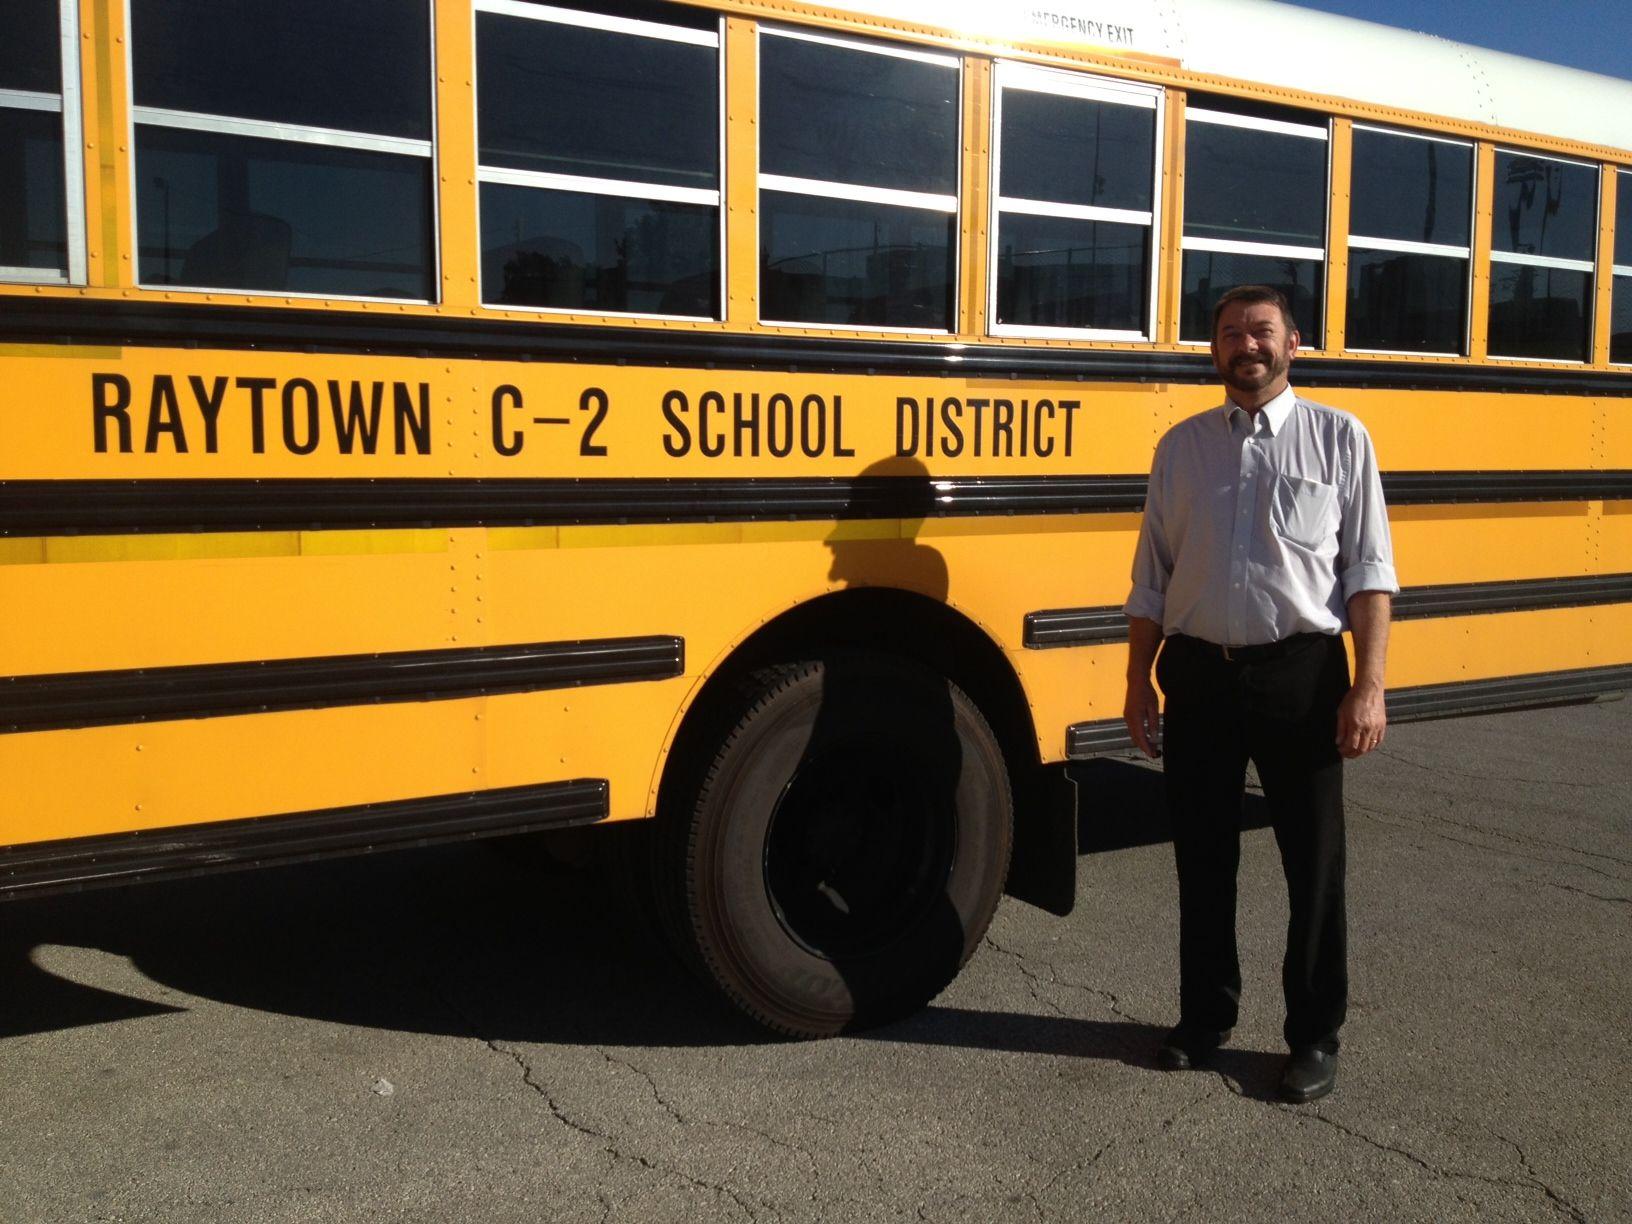 Department Boosts Behavior Training, Improves Bus Environment